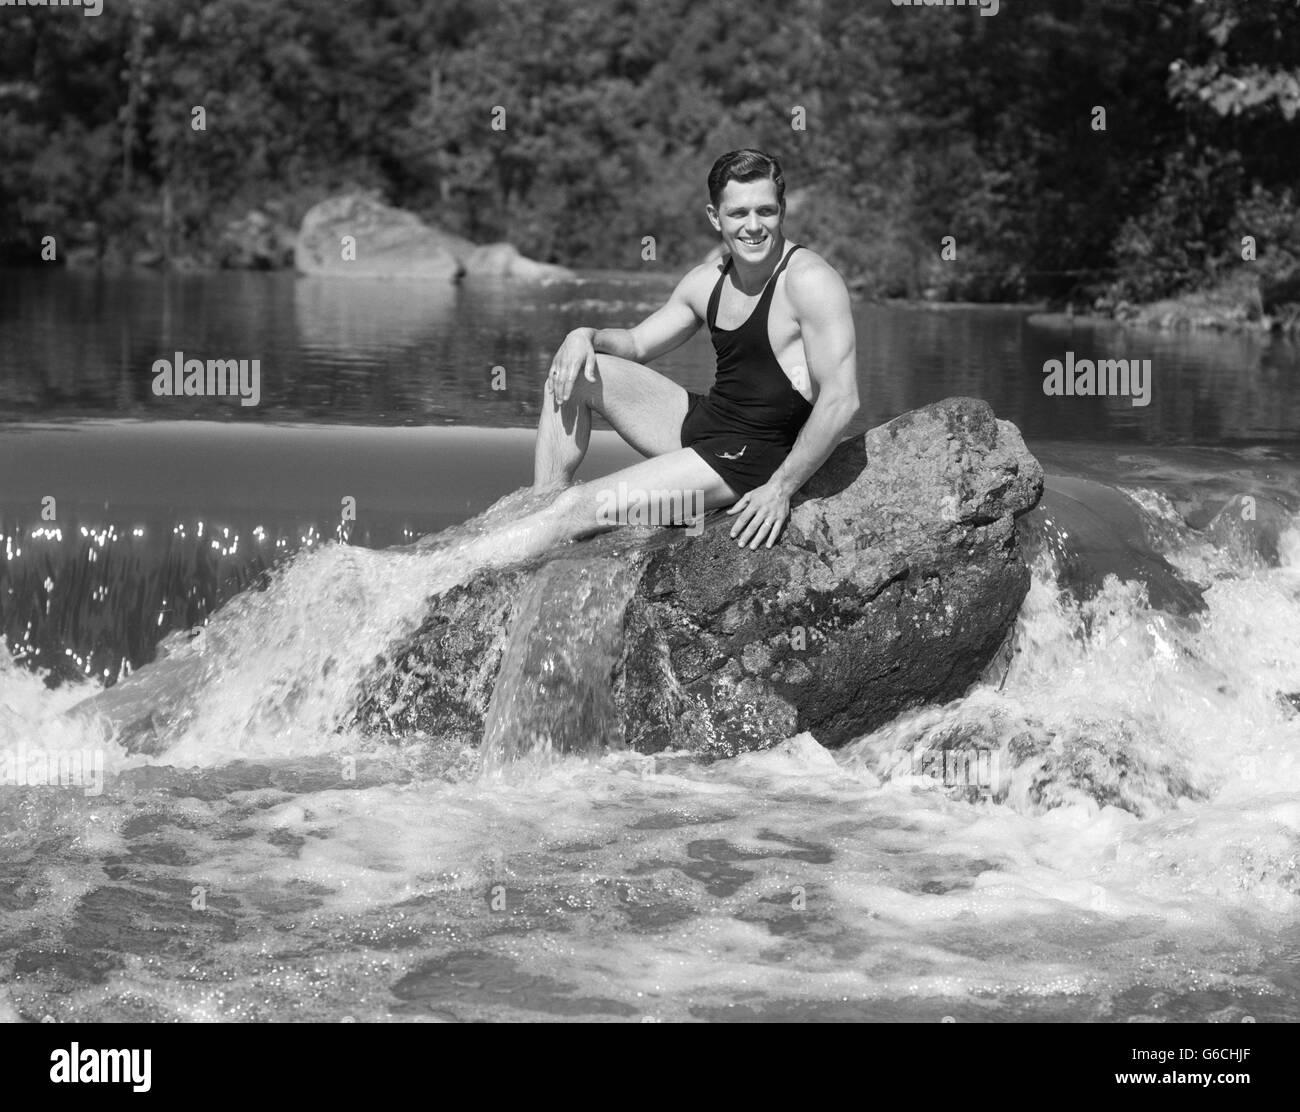 1930s SMILING MAN LOOKING AT CAMERA WEARING BATHING SUIT TANK TOP SWIM TRUNKS POSING SITTING ON LARGE ROCK IN WOODLAND - Stock Image